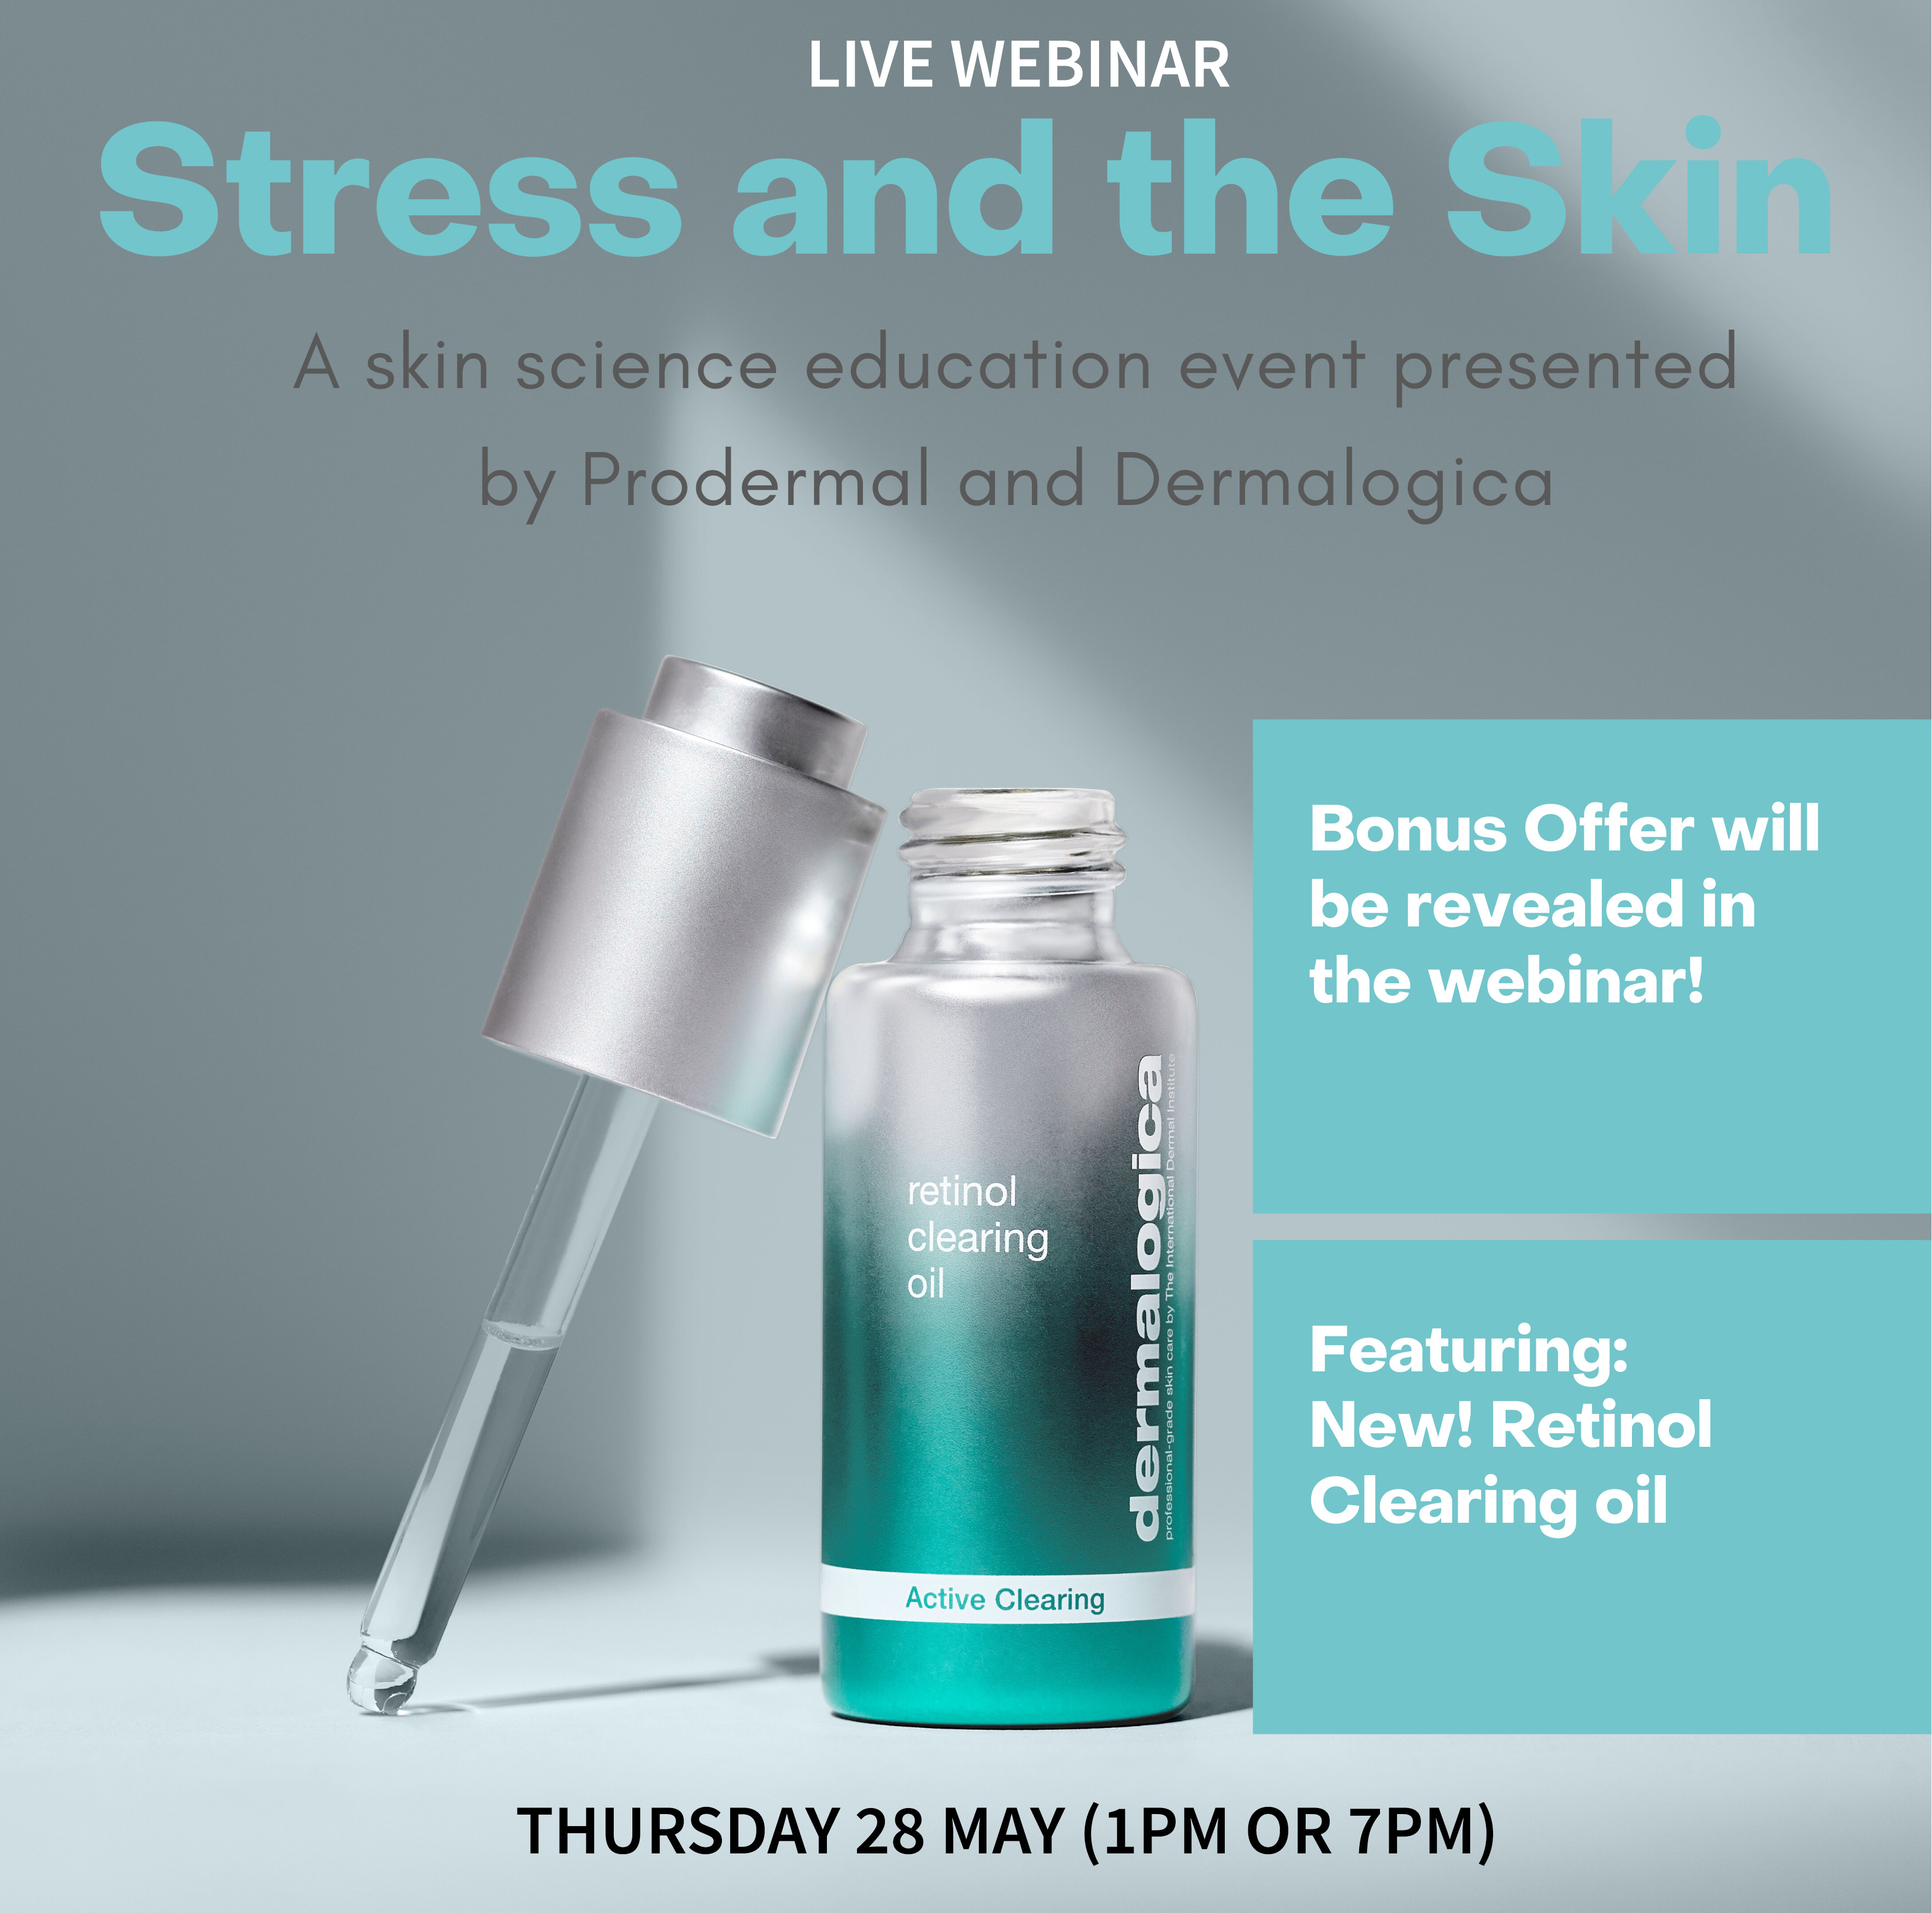 webinar - stress and teh skin by prodermal